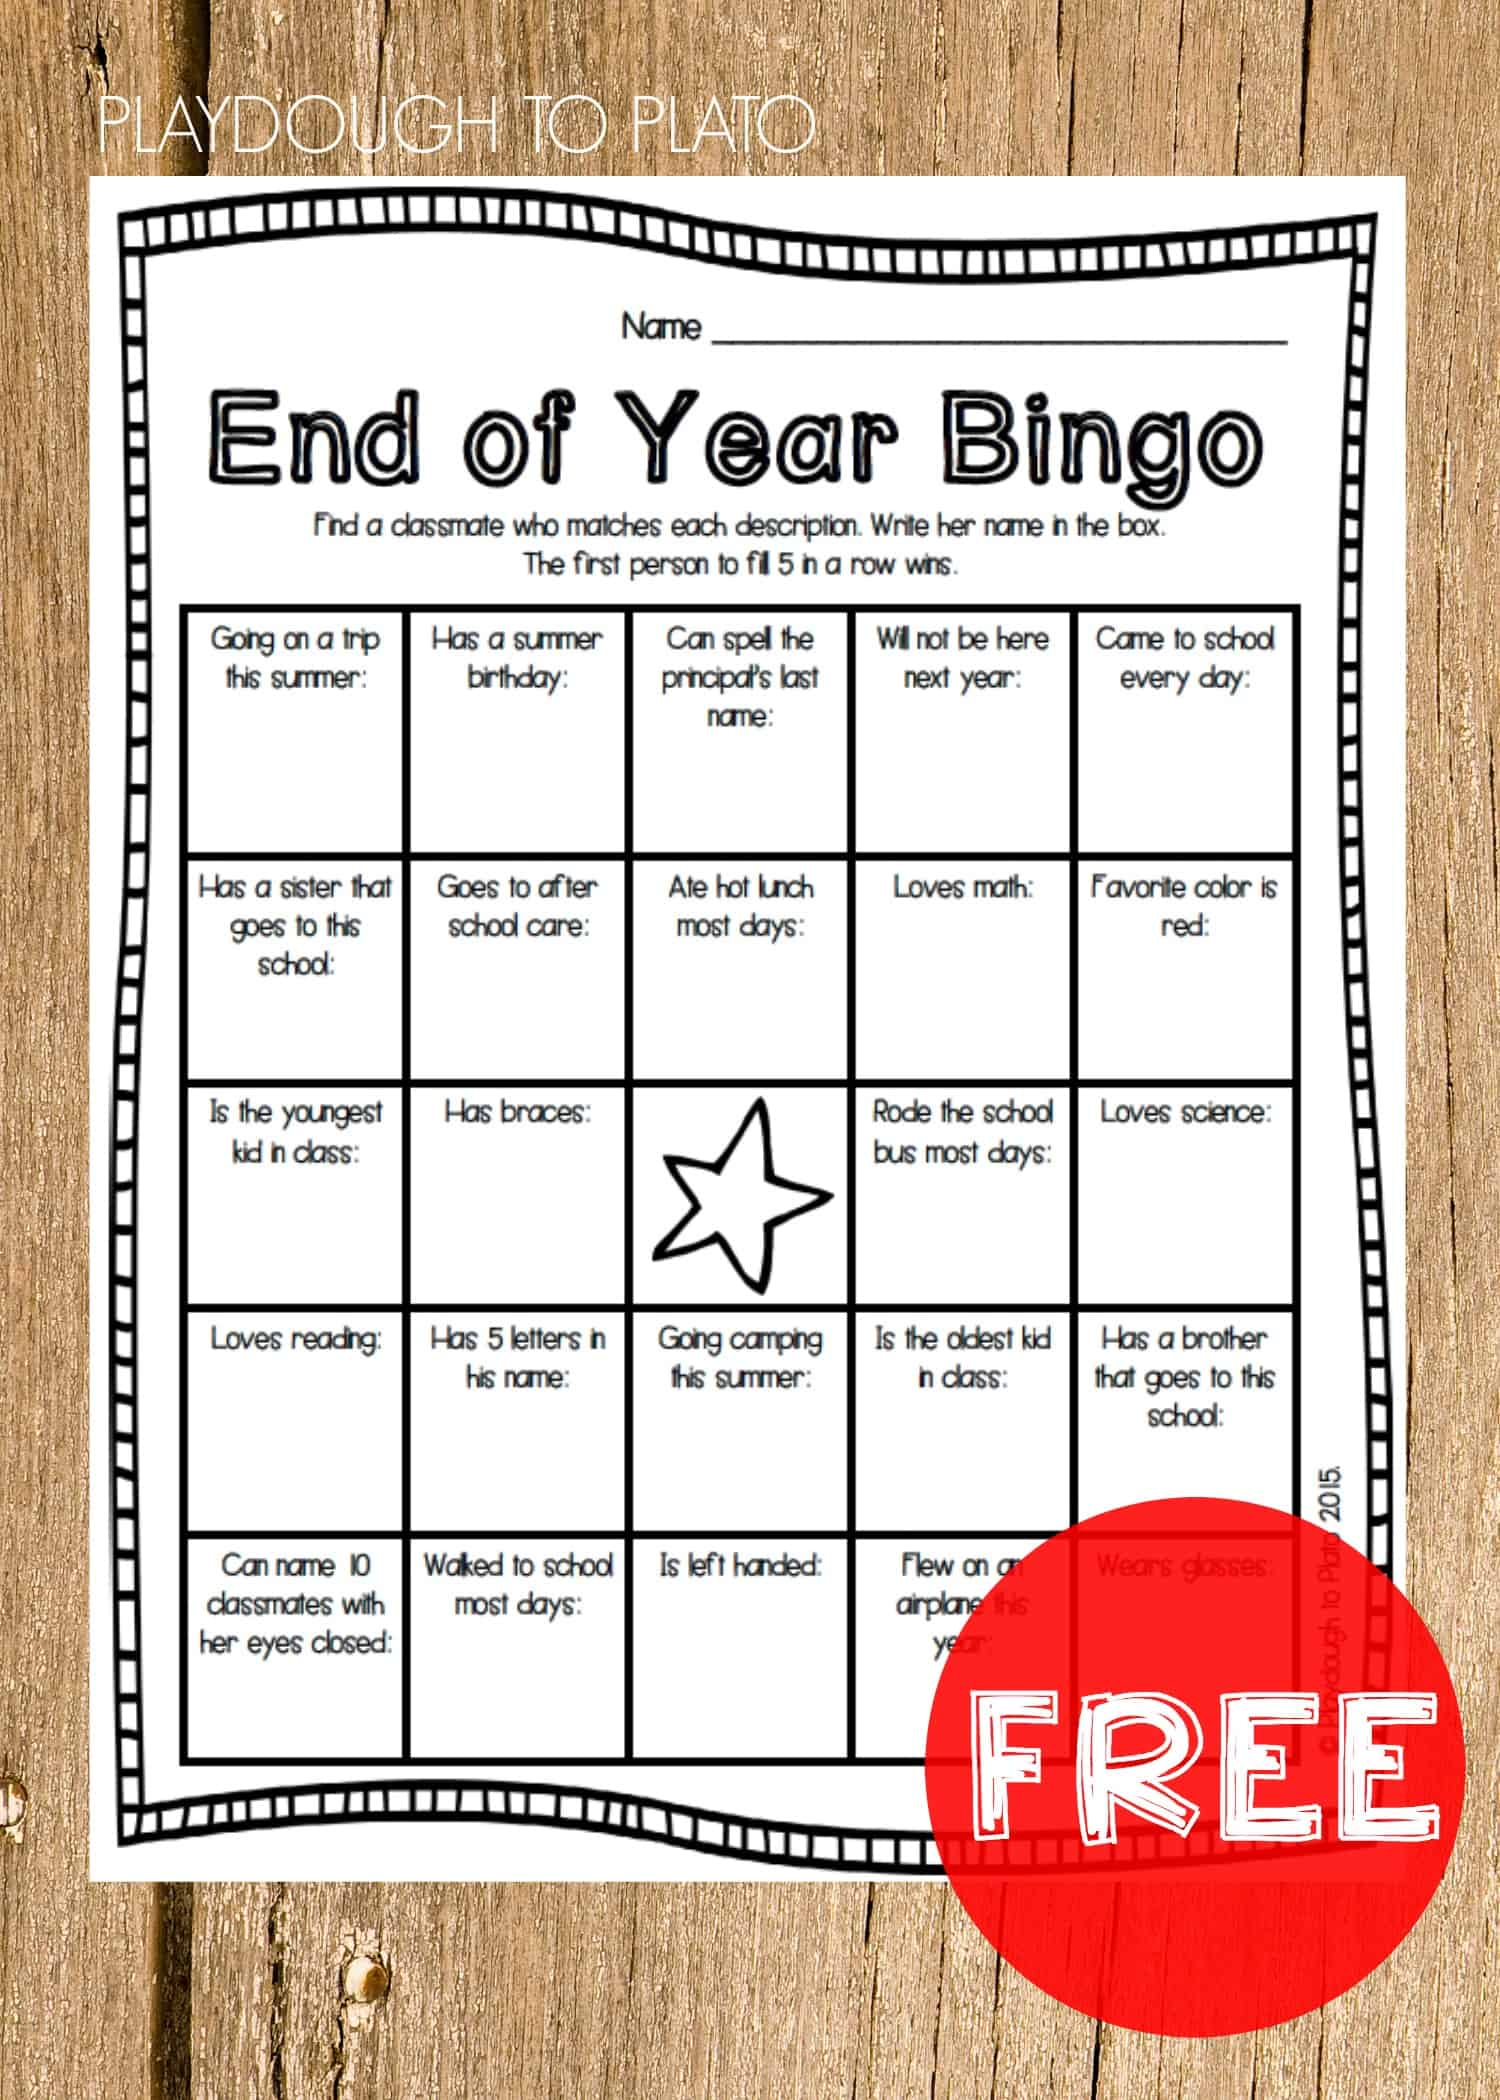 End-of-the-Year-Bingo